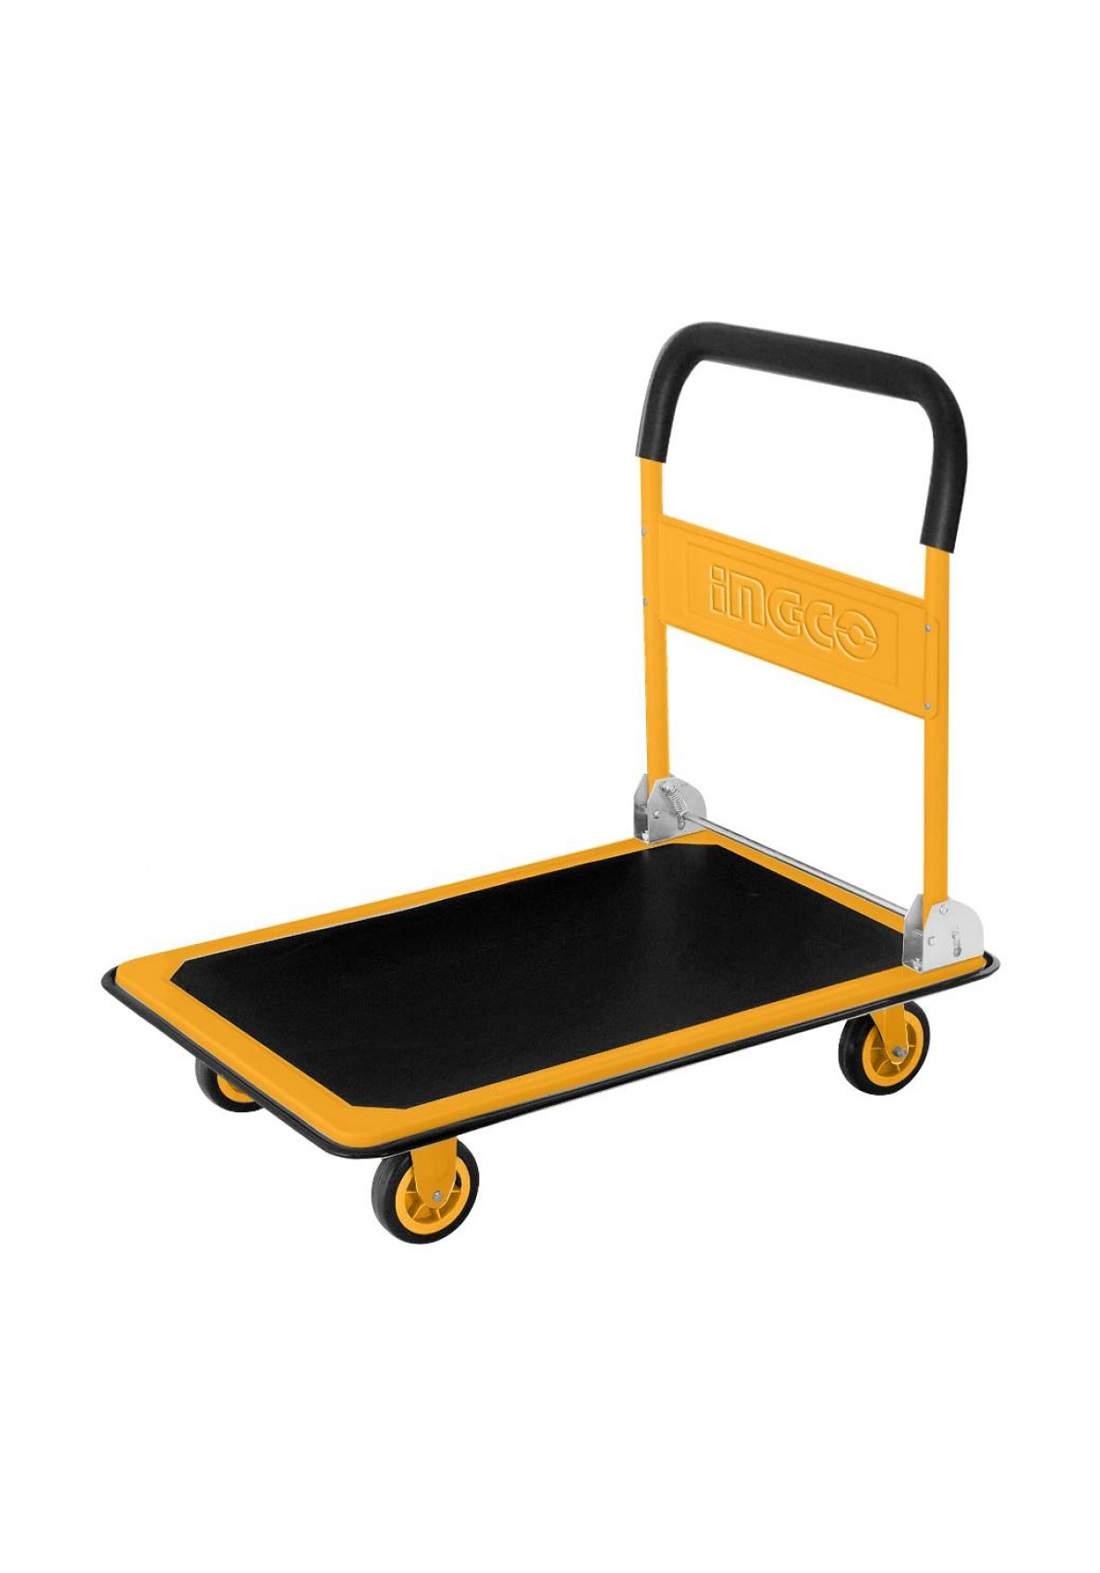 Ingco HPHT13002 Storage cart 300 kg عربة نقل